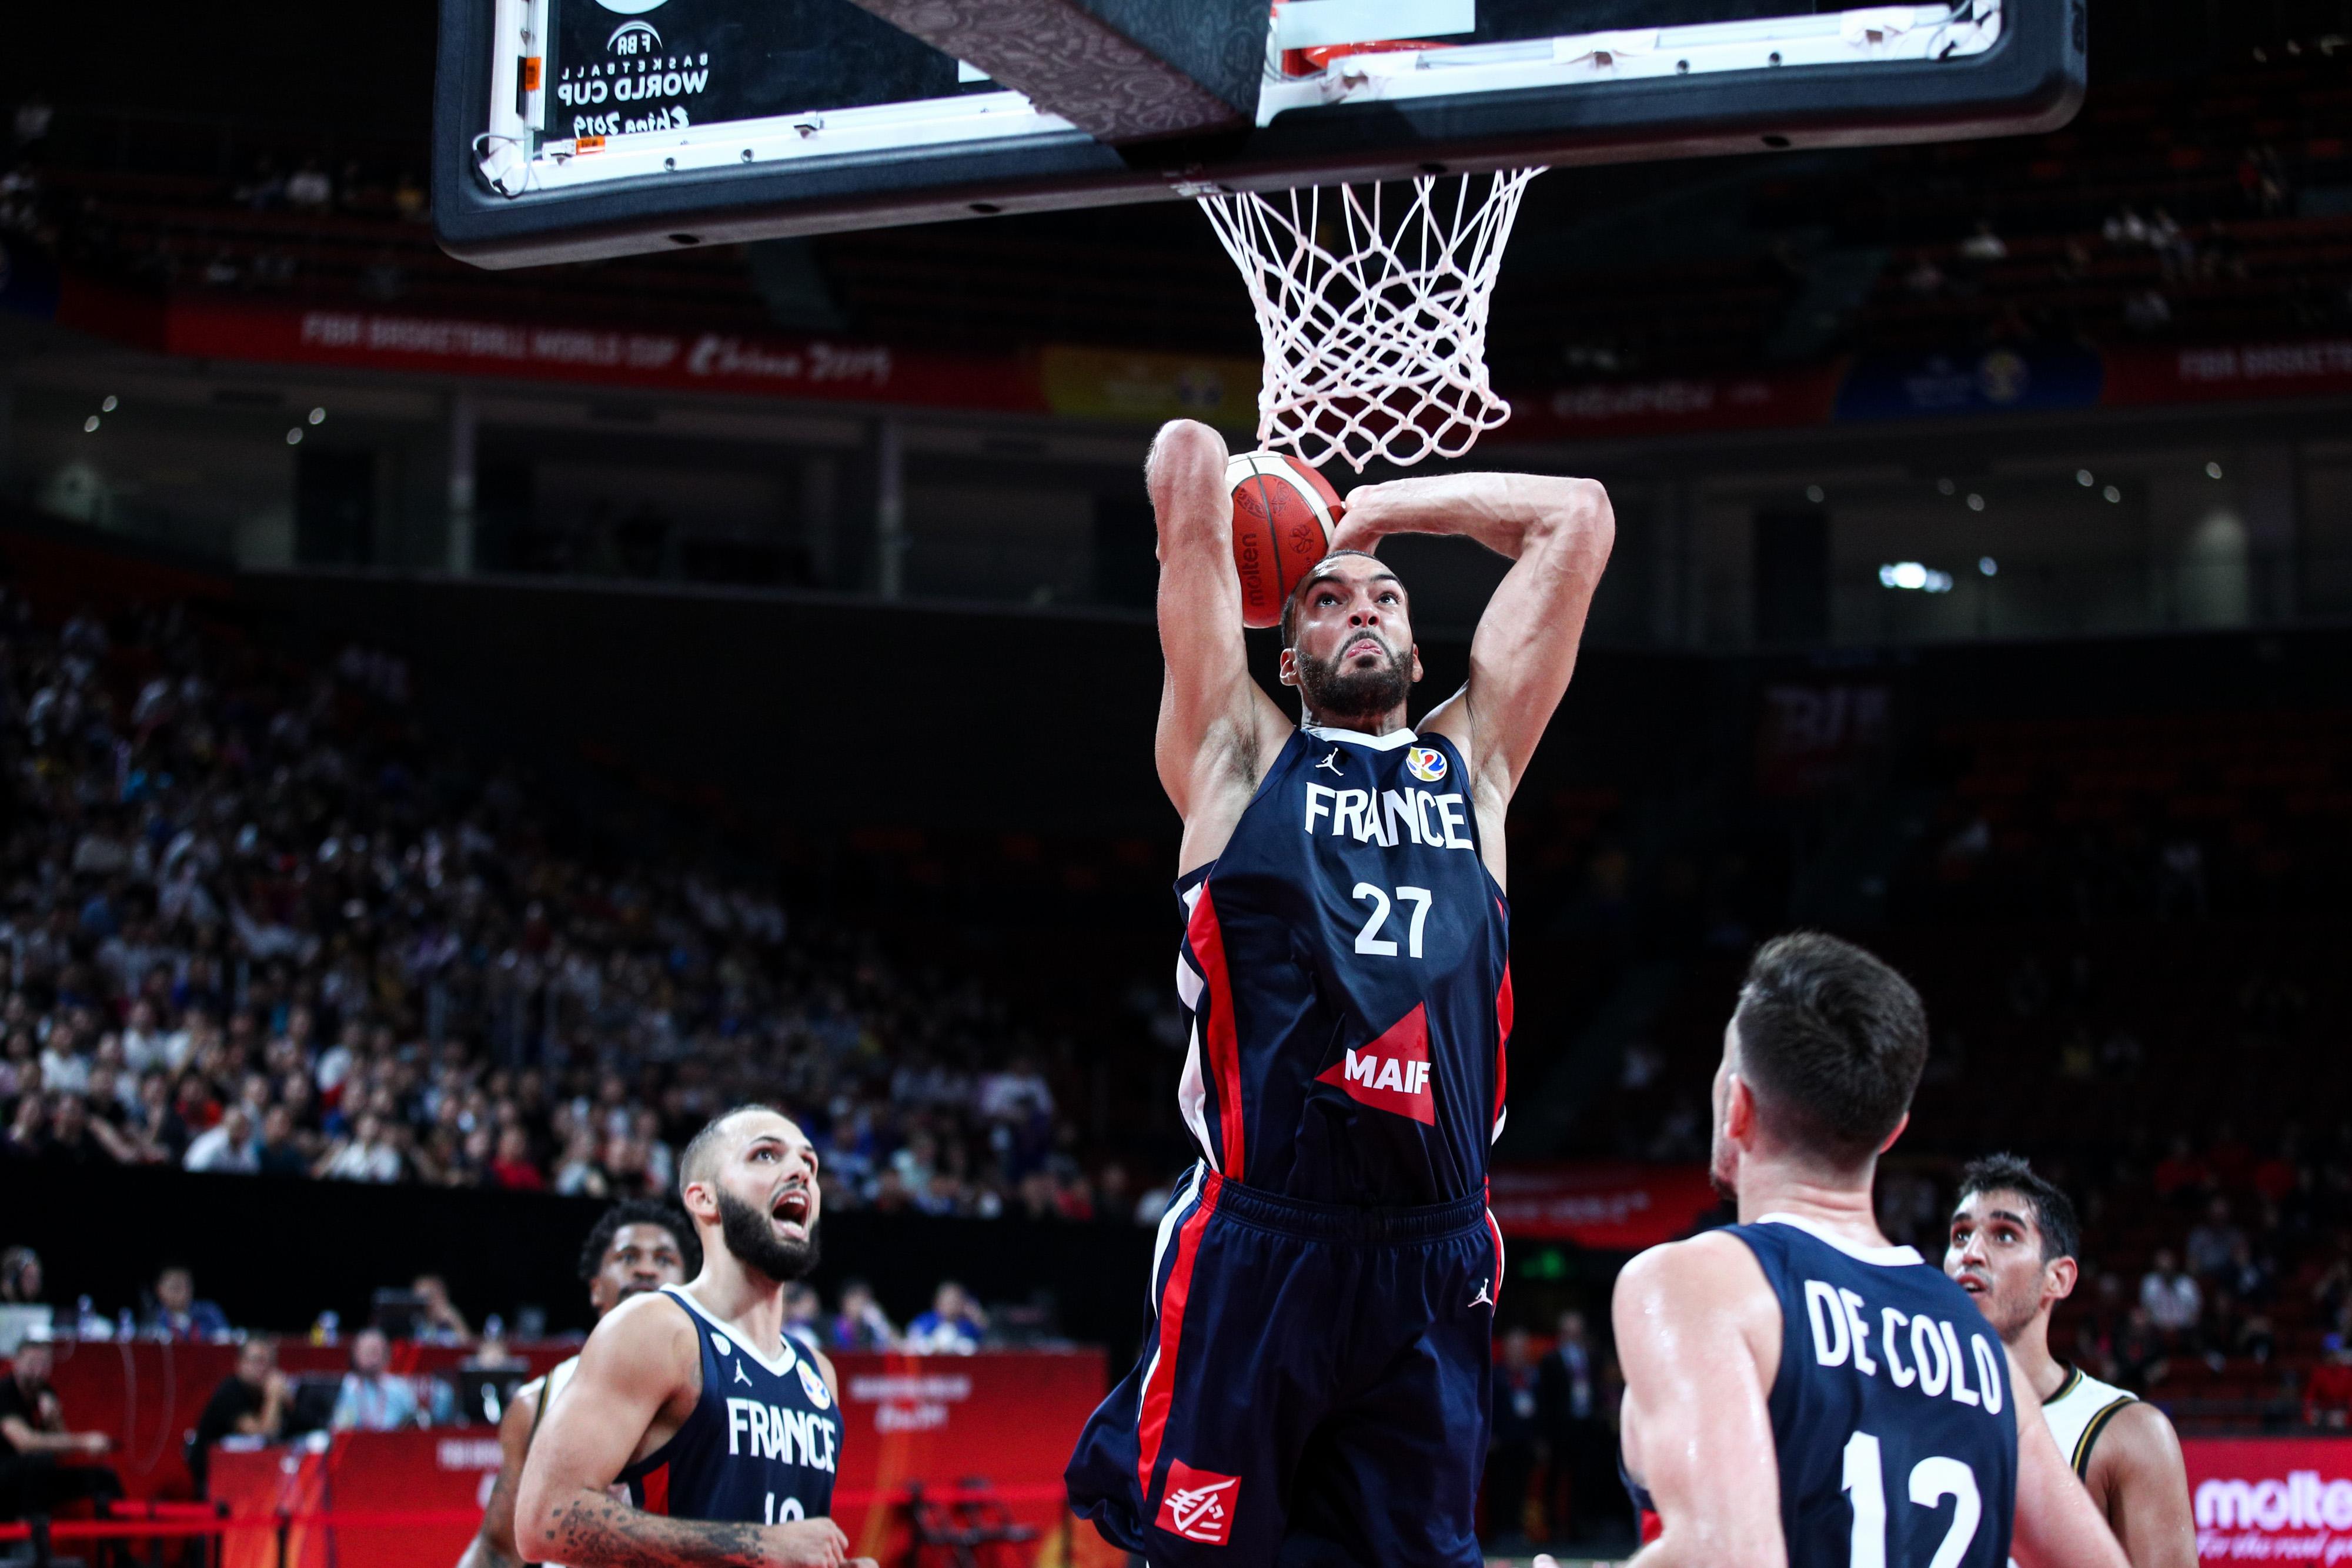 Jordan v France: Group G - FIBA World Cup 2019